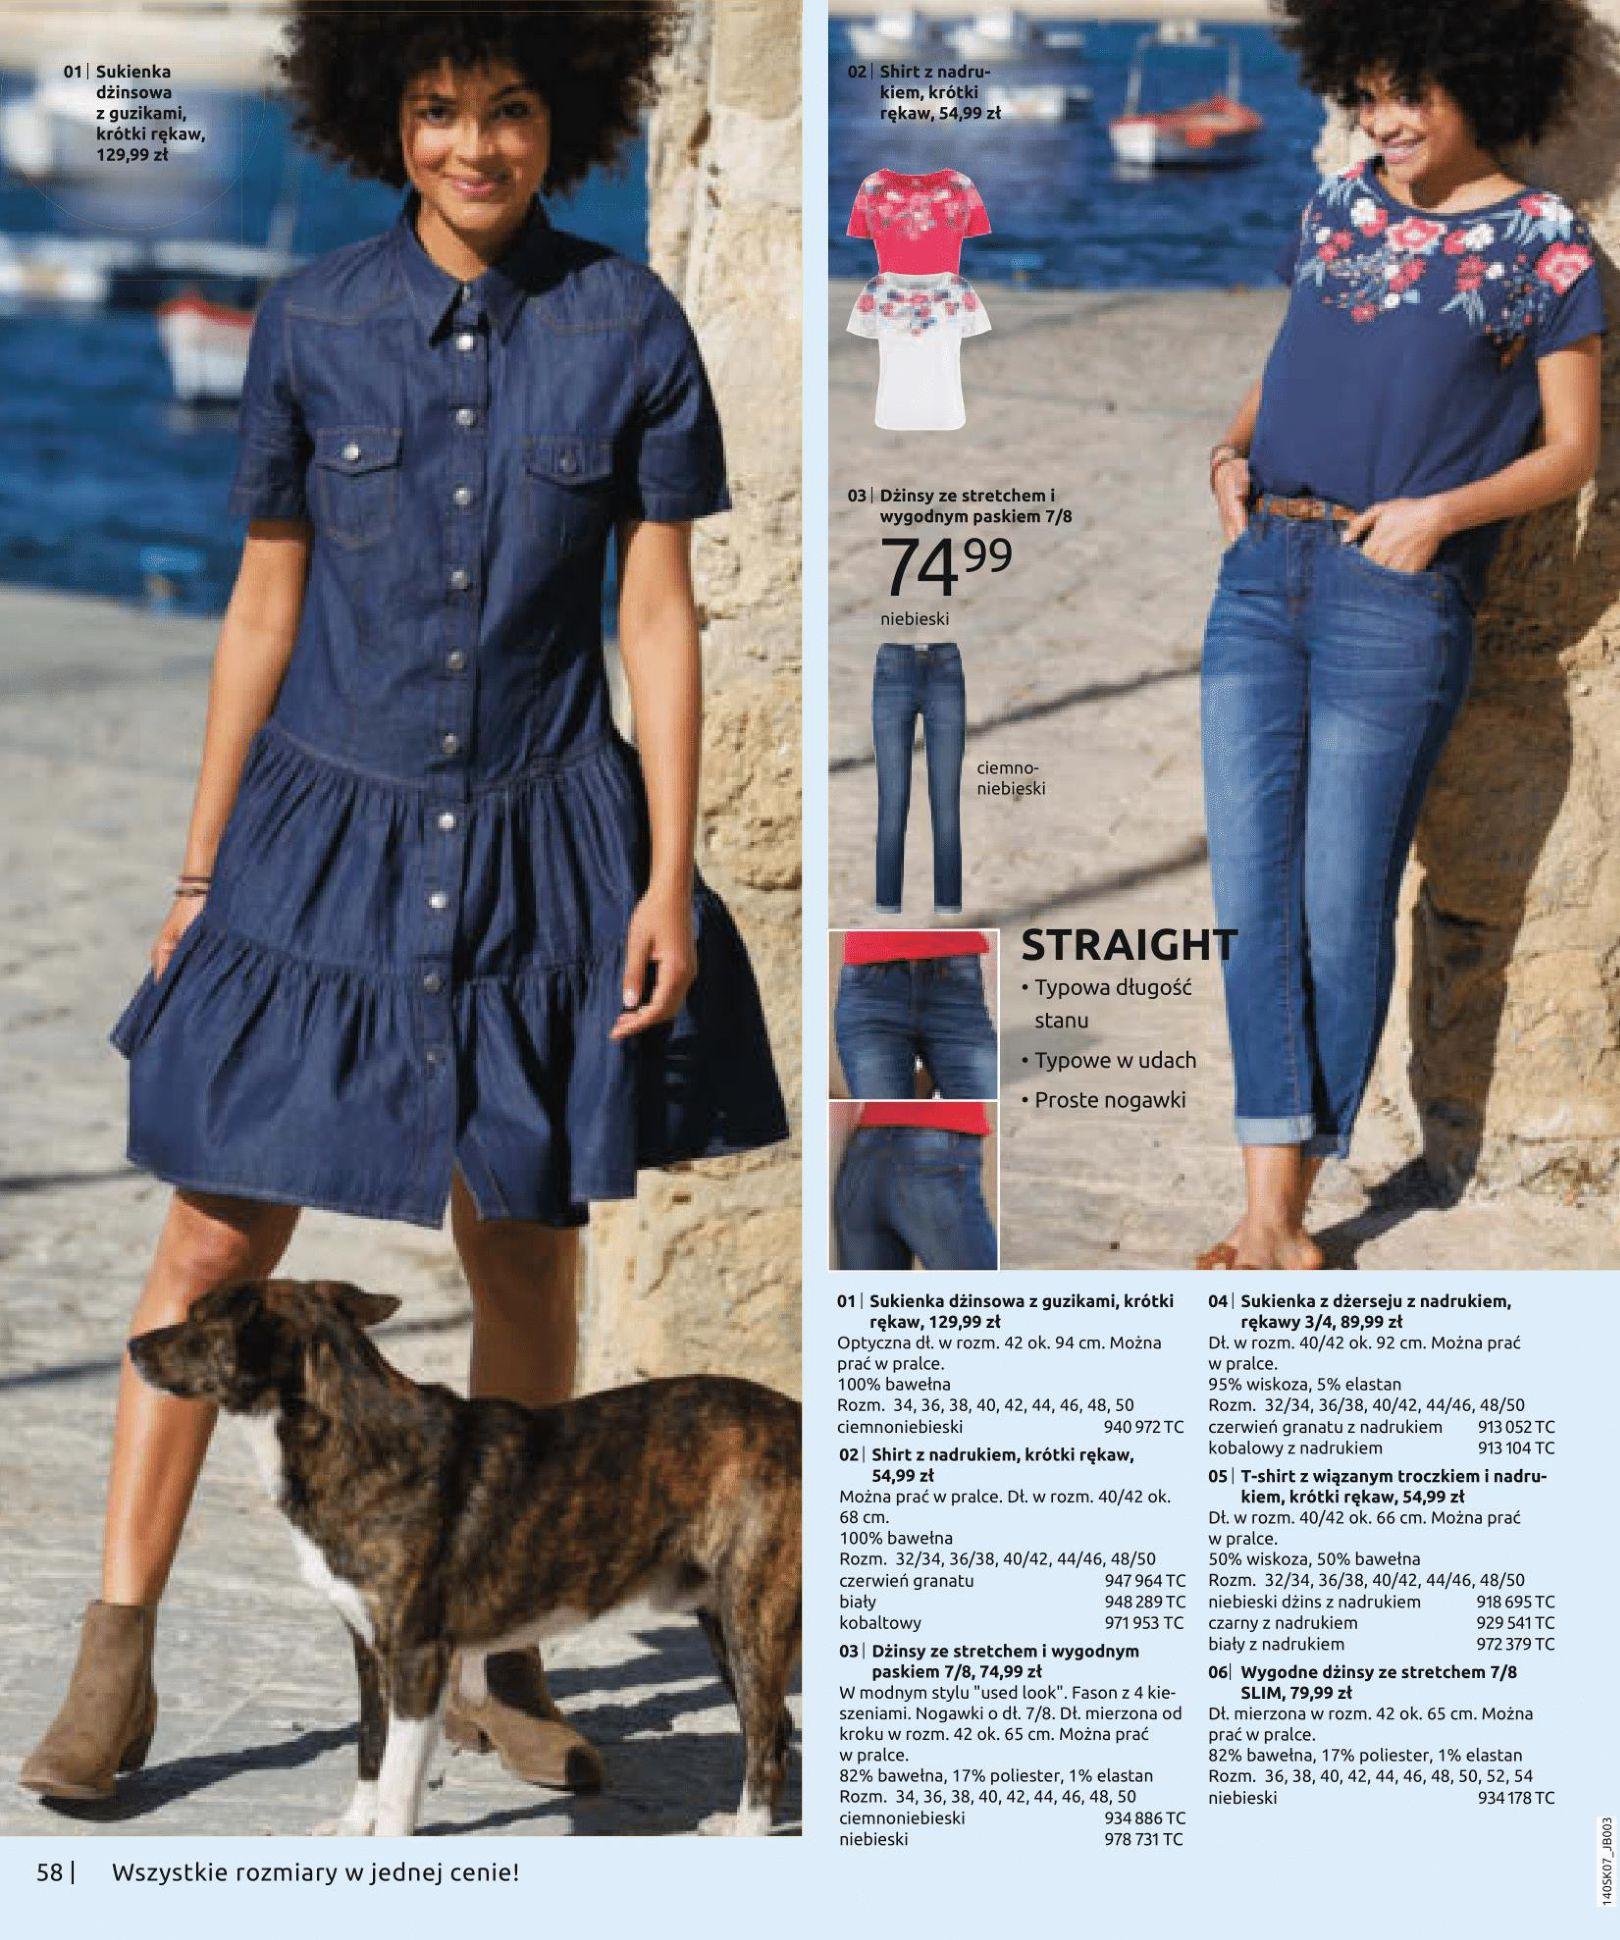 Gazetka Bonprix - Letnie trendy-02.07.2019-15.01.2020-page-60